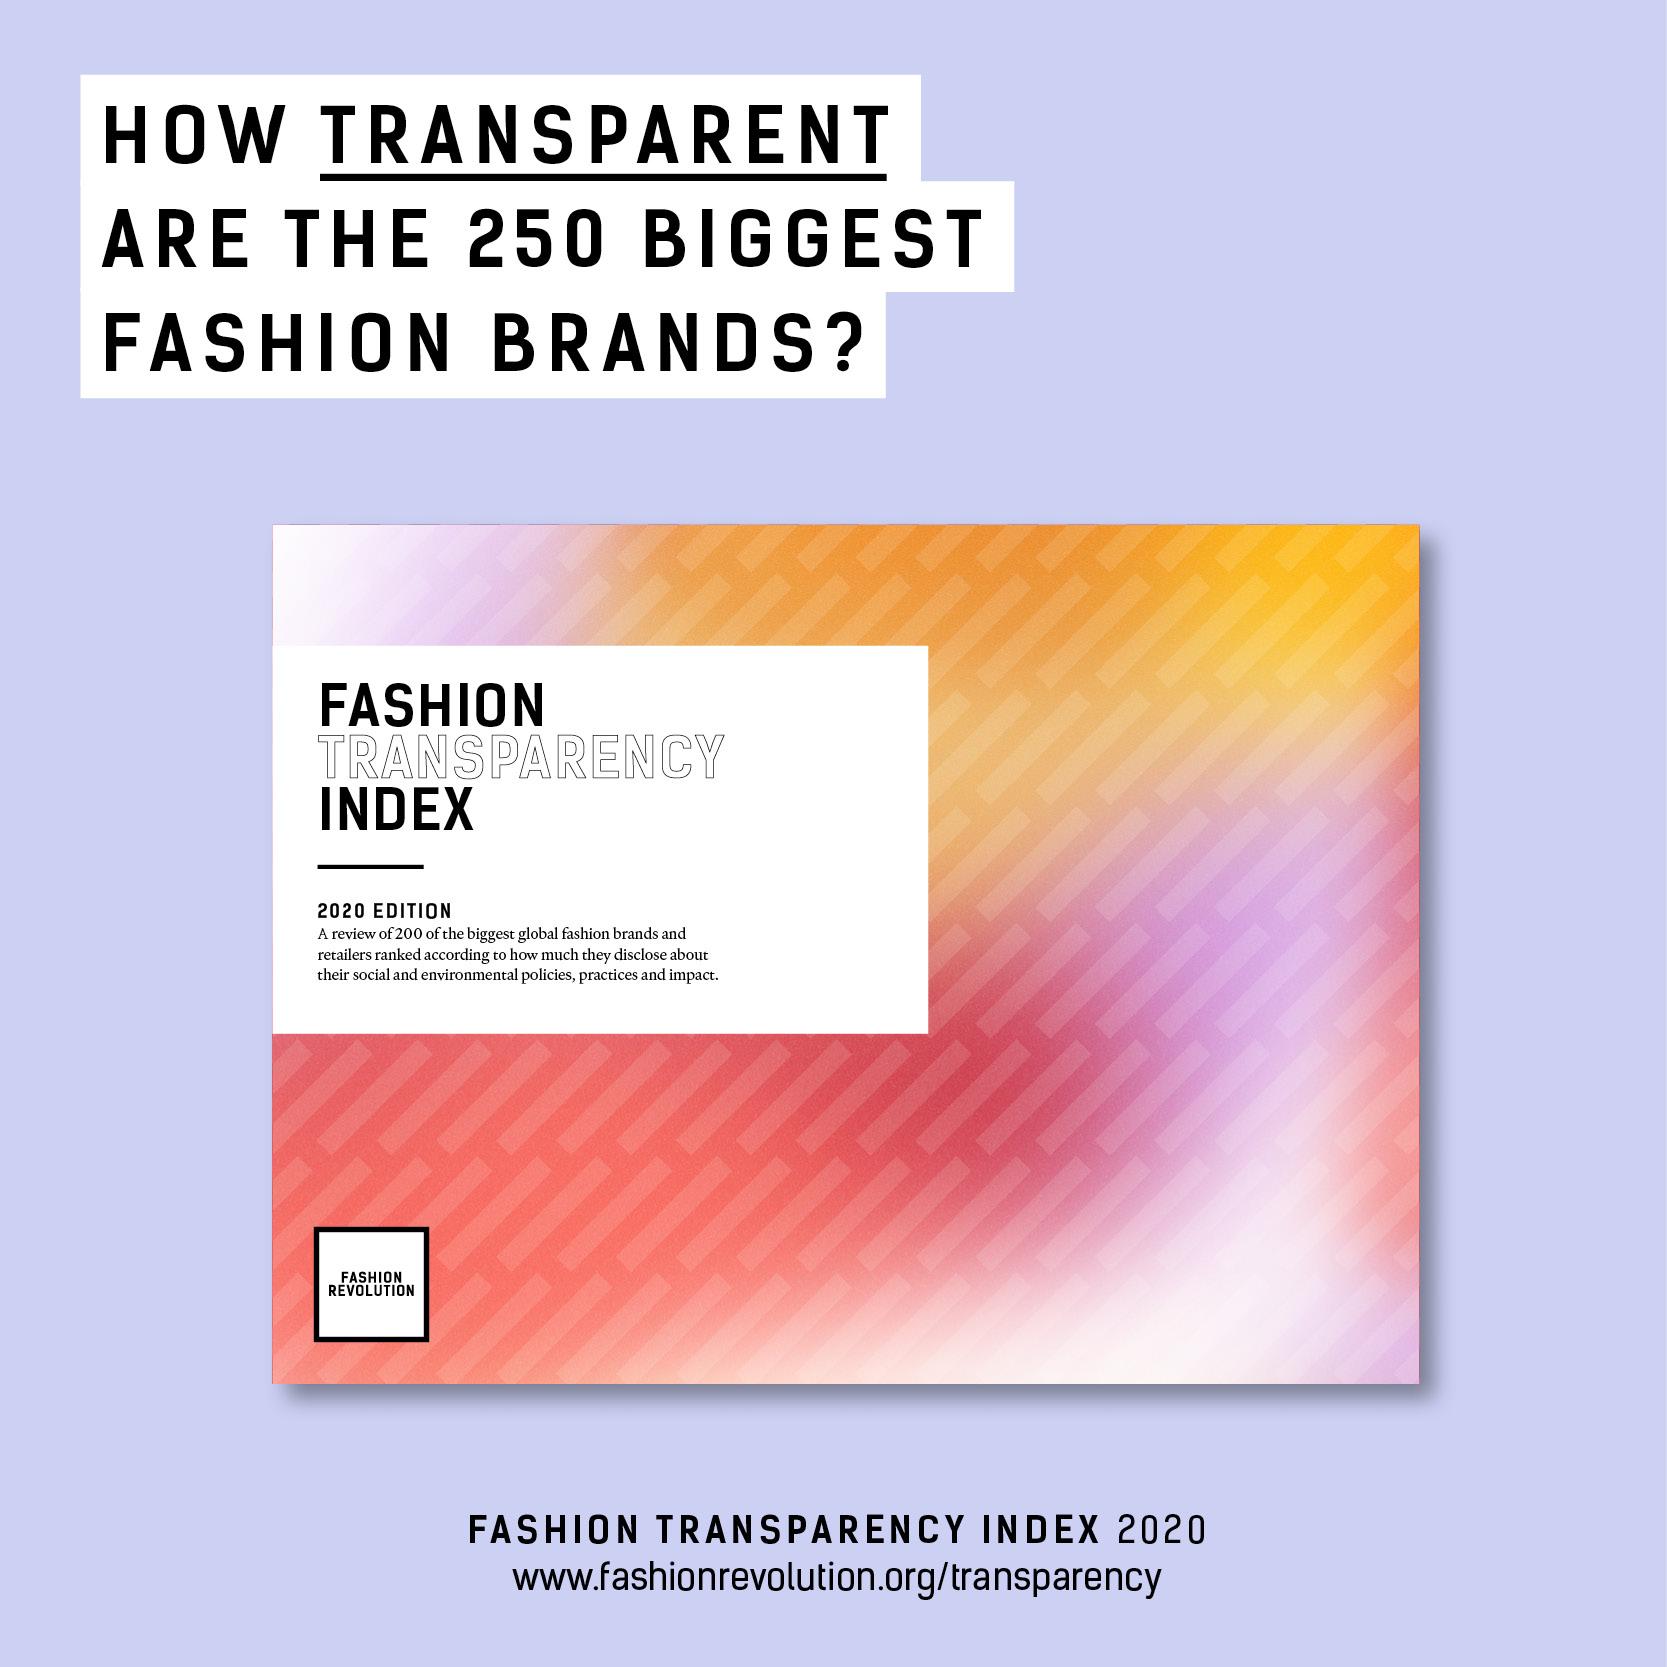 Image: Fashion Revolution